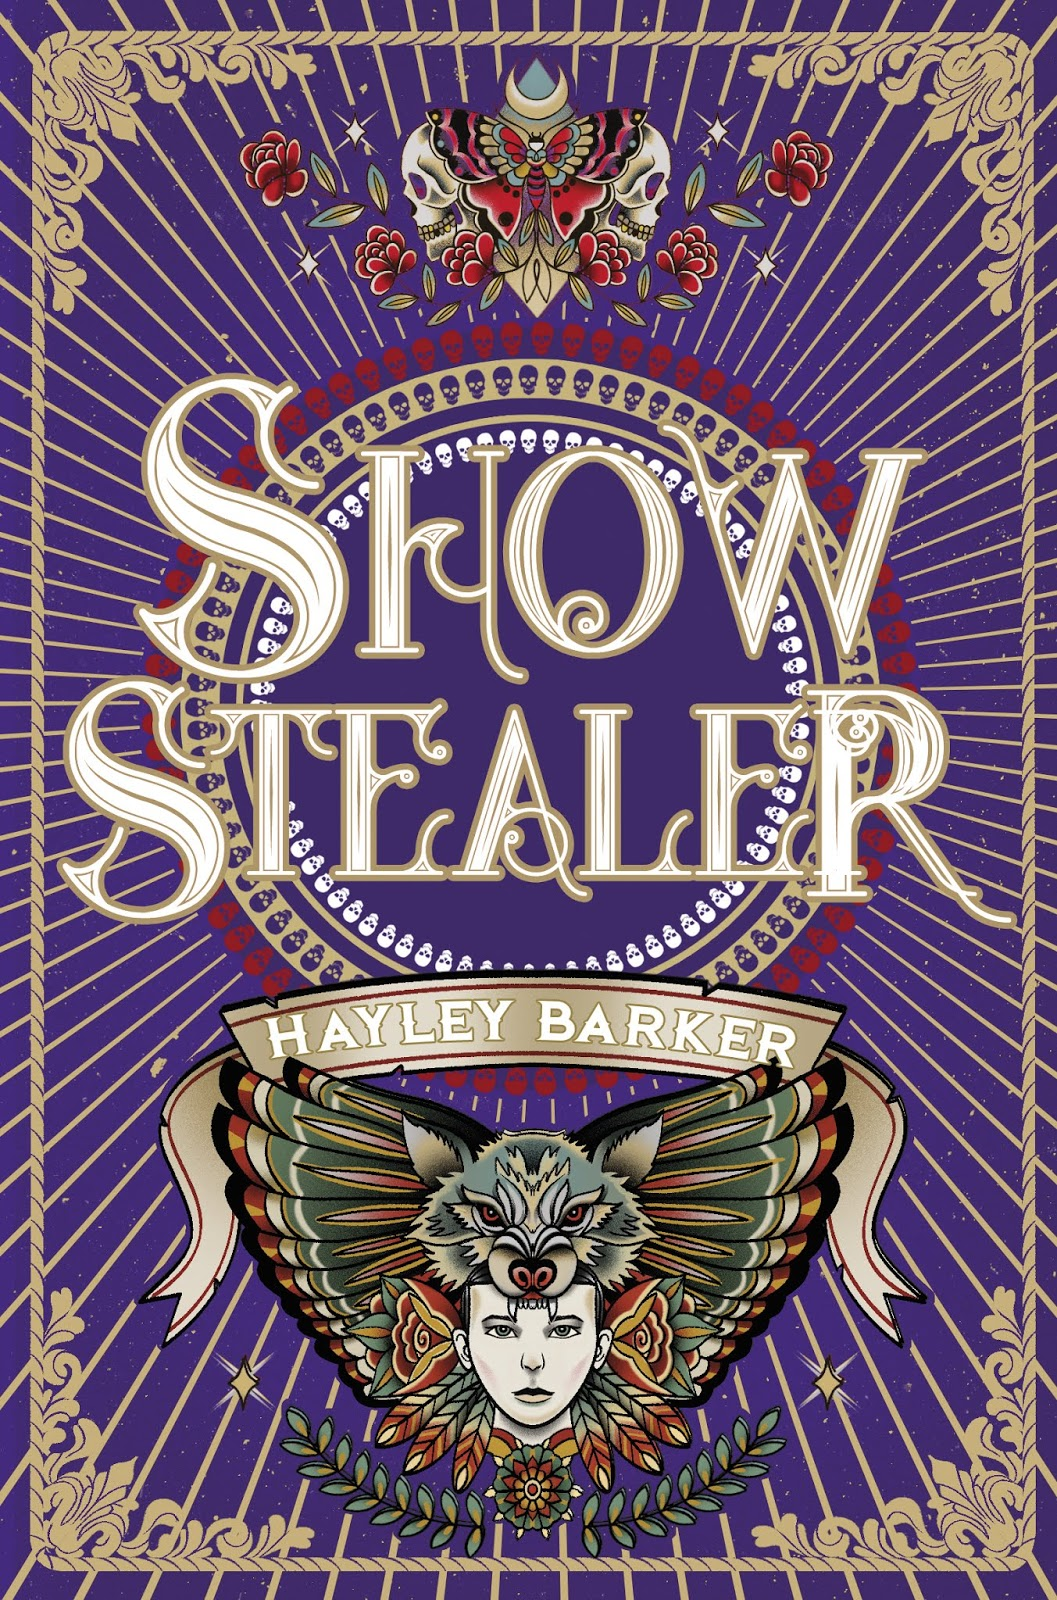 Show Stealer by Hayley Barker